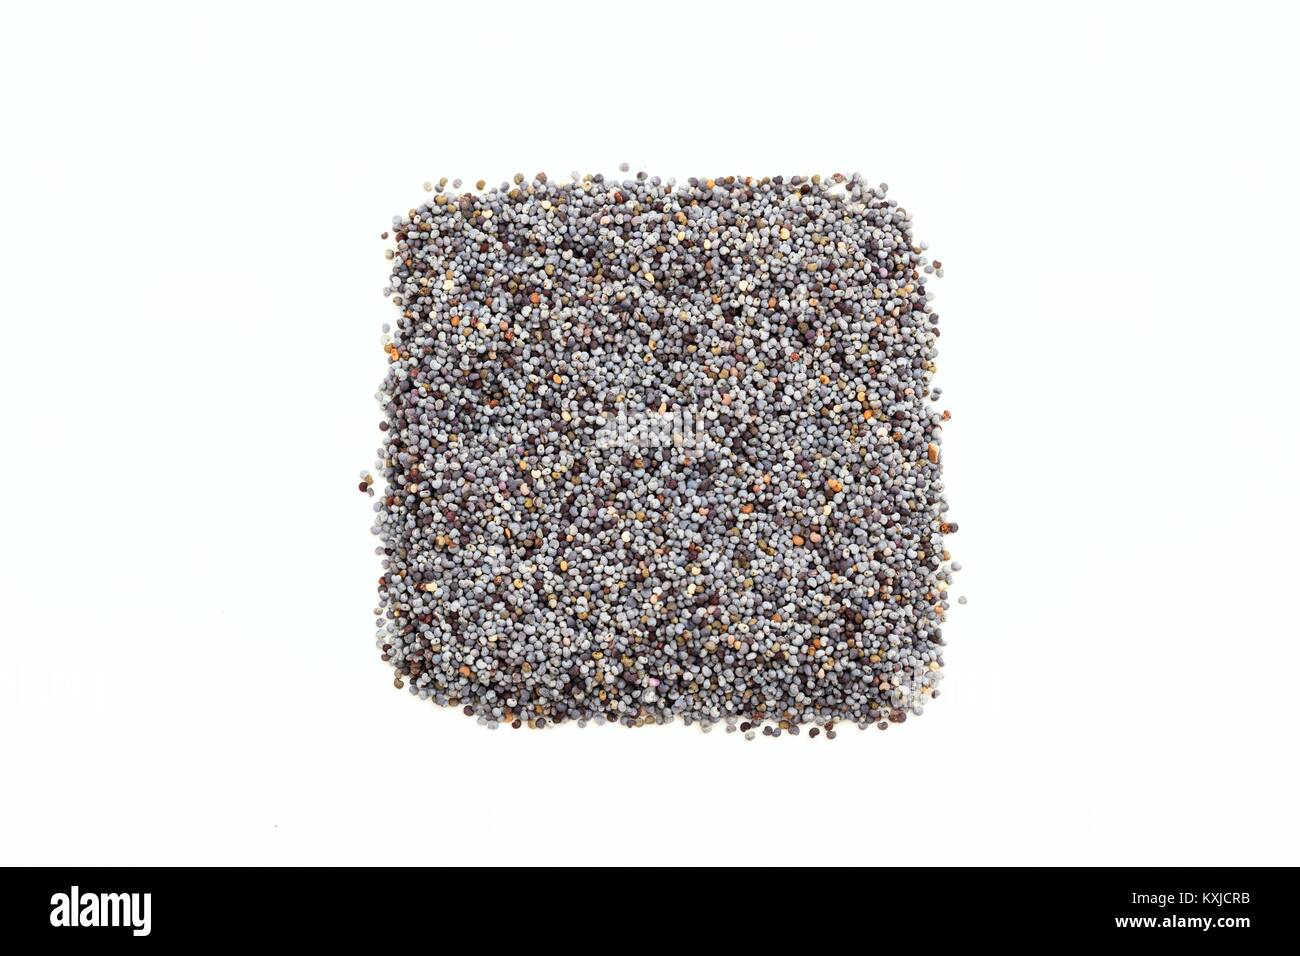 Black poppy seeds on white background - Stock Image